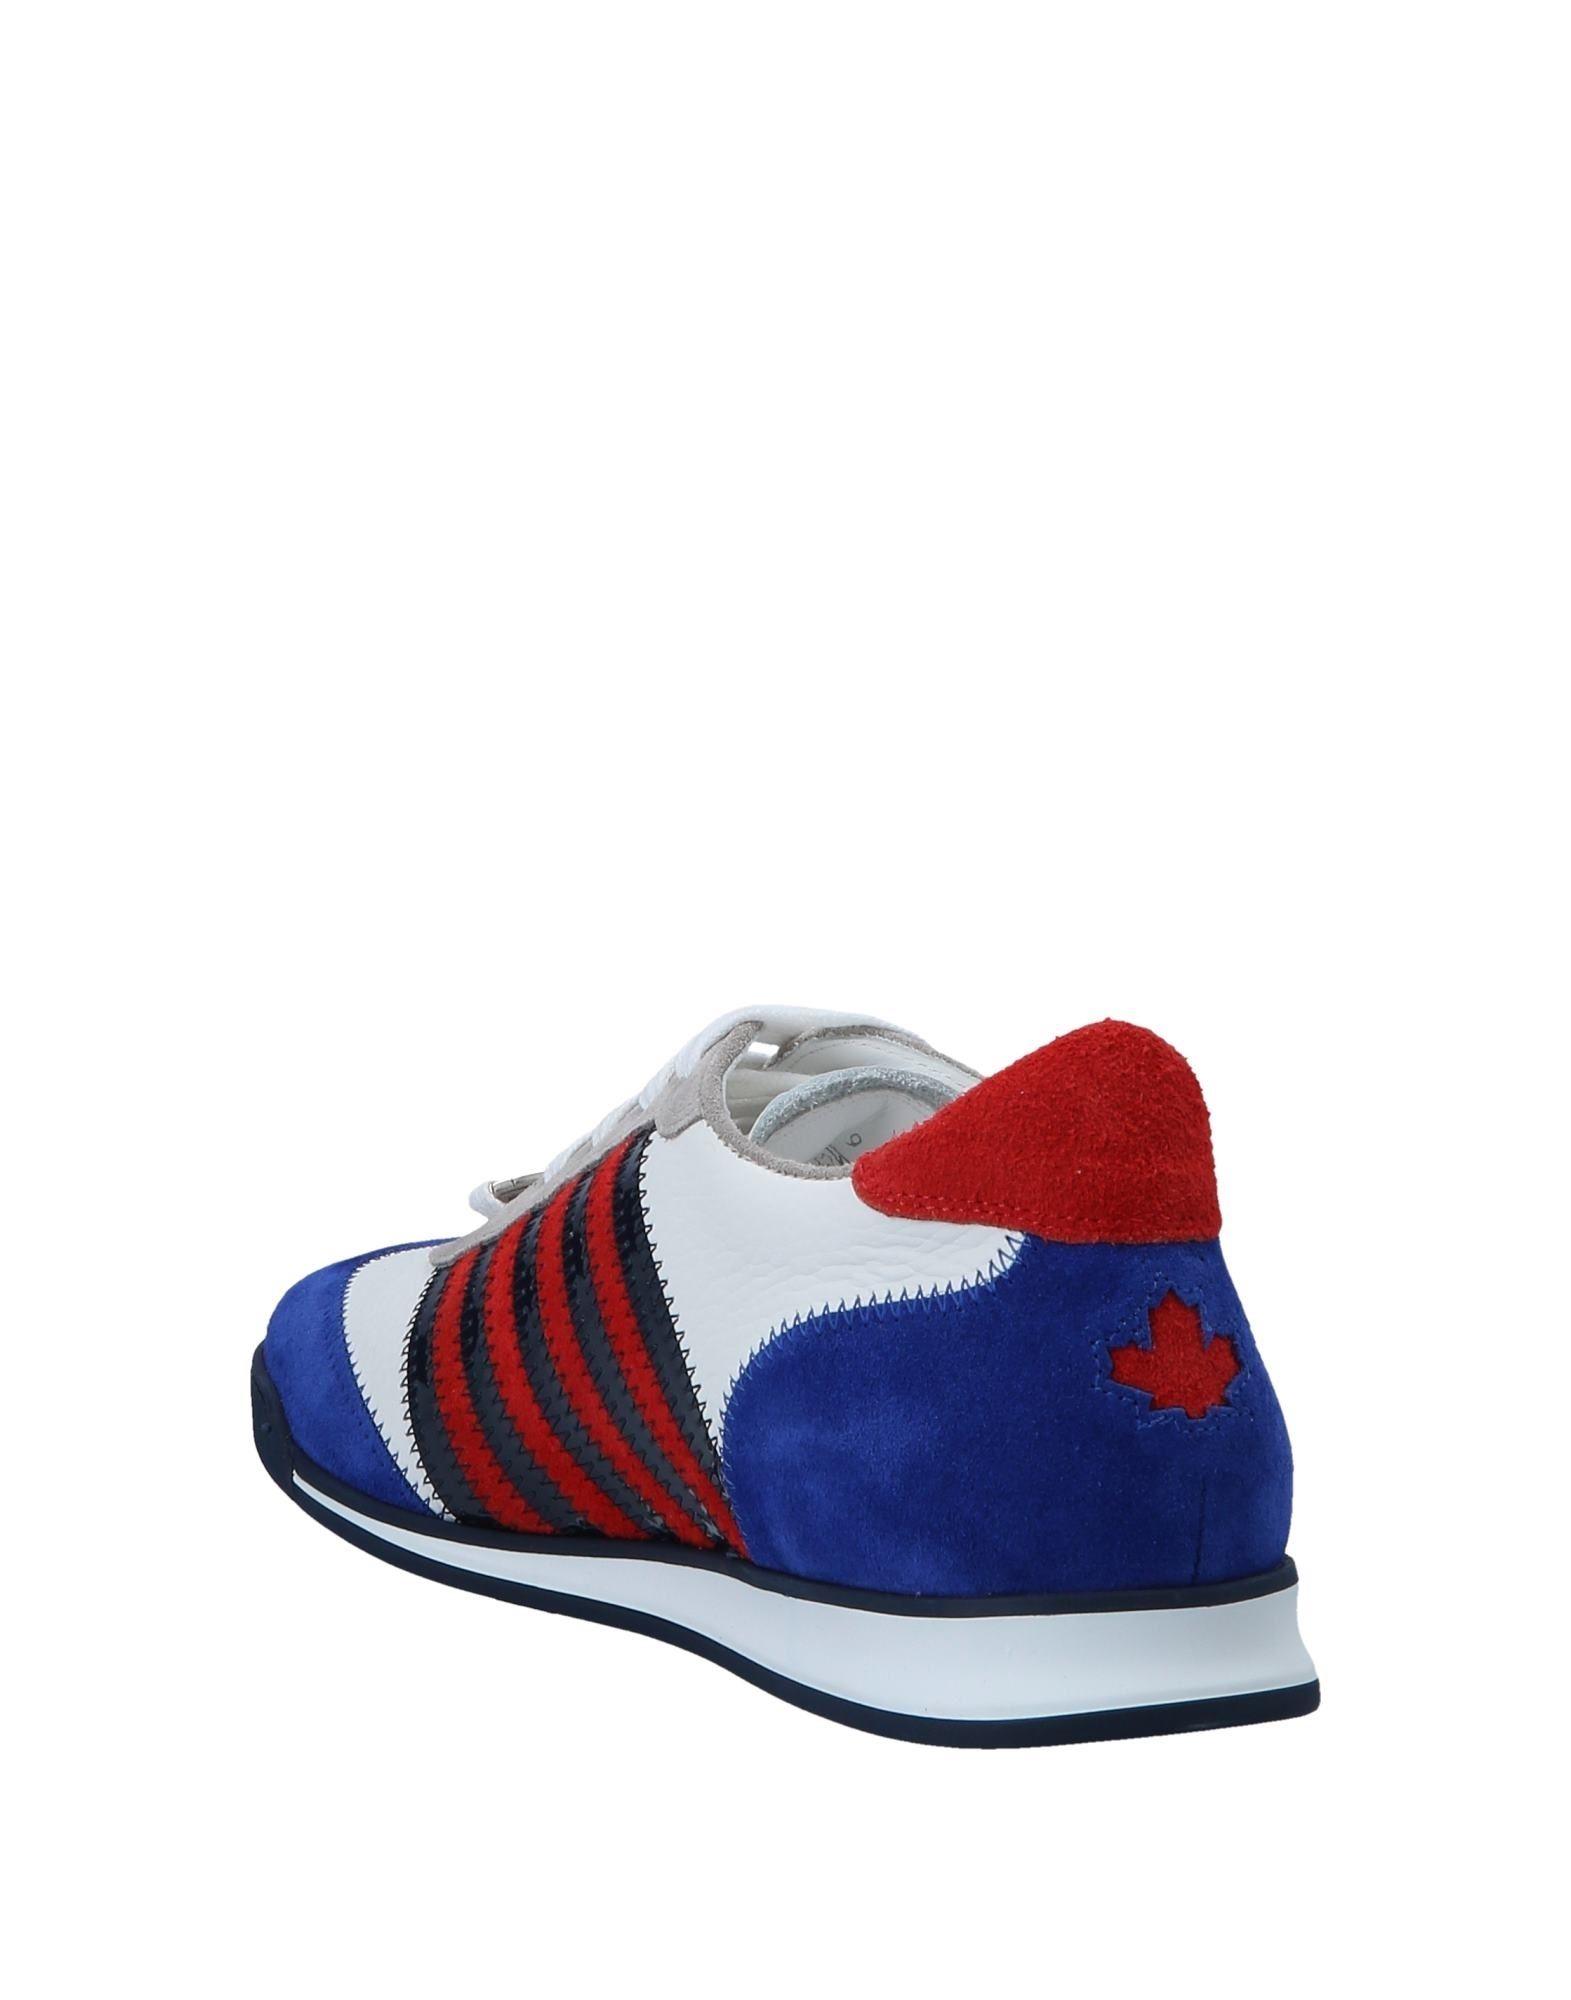 Dsquared2 Sneakers Herren  Schuhe 11553824FH Gute Qualität beliebte Schuhe  aee9e1